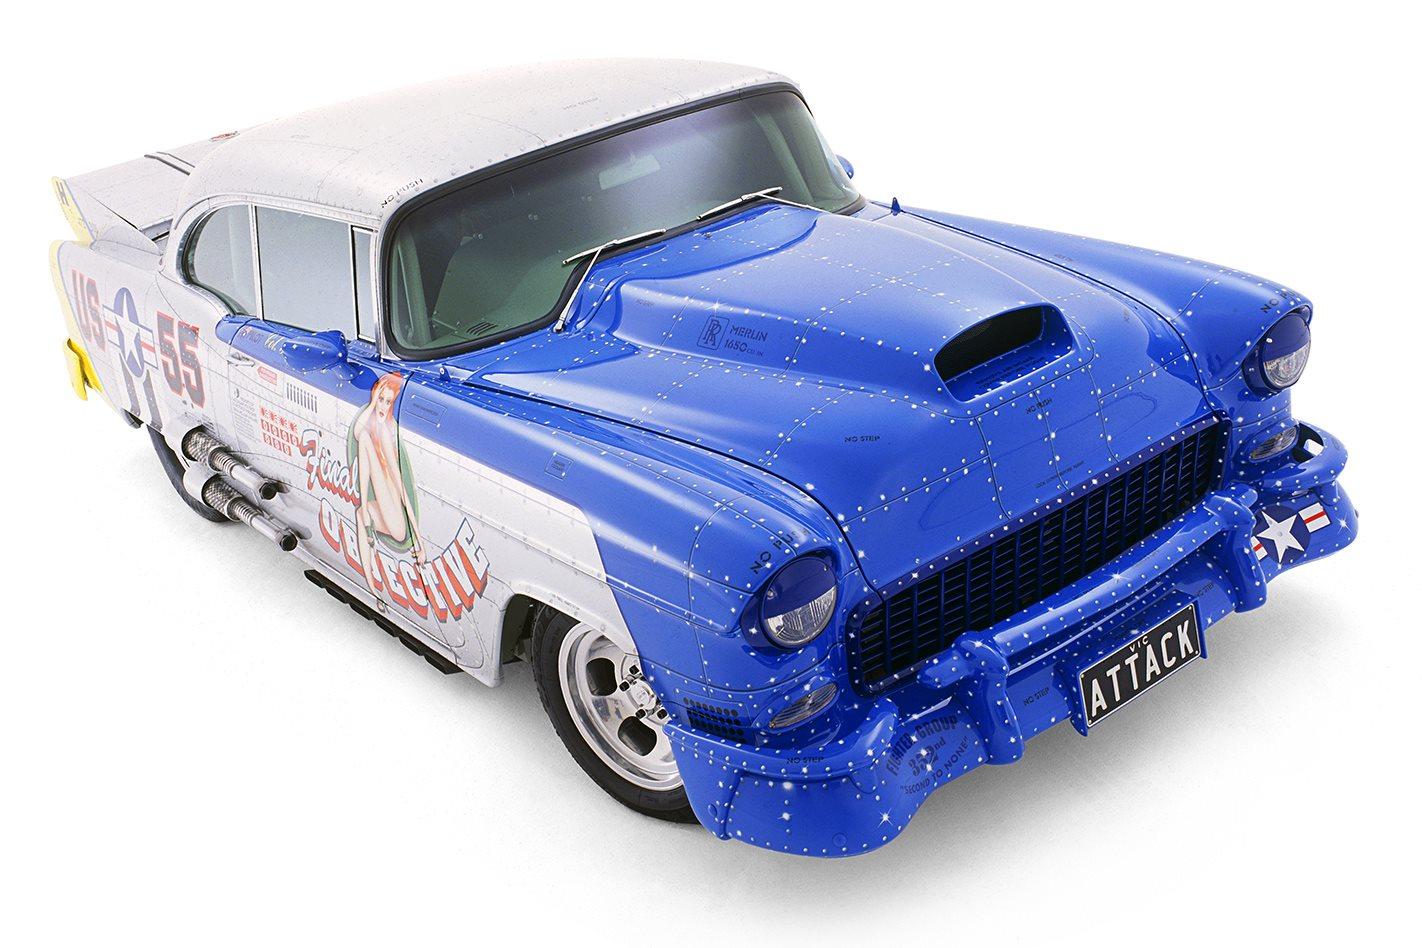 1955 Chevrolet Massive Attack